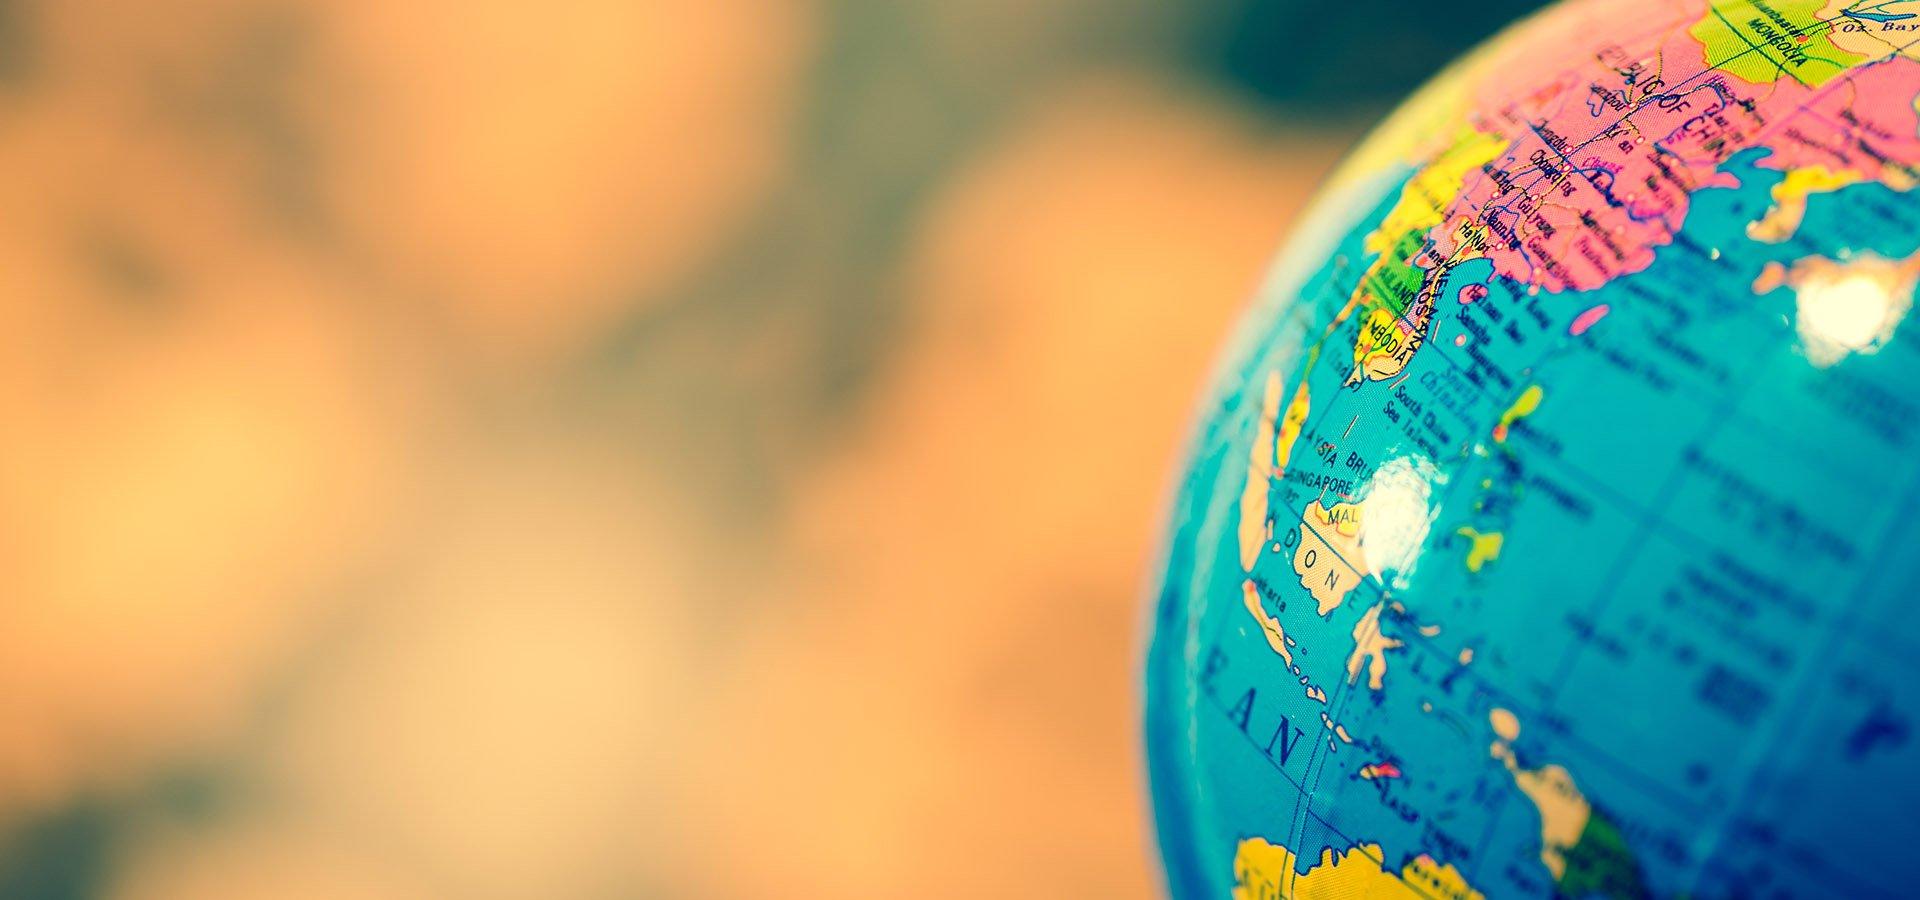 internacionalizacion exmas huesca